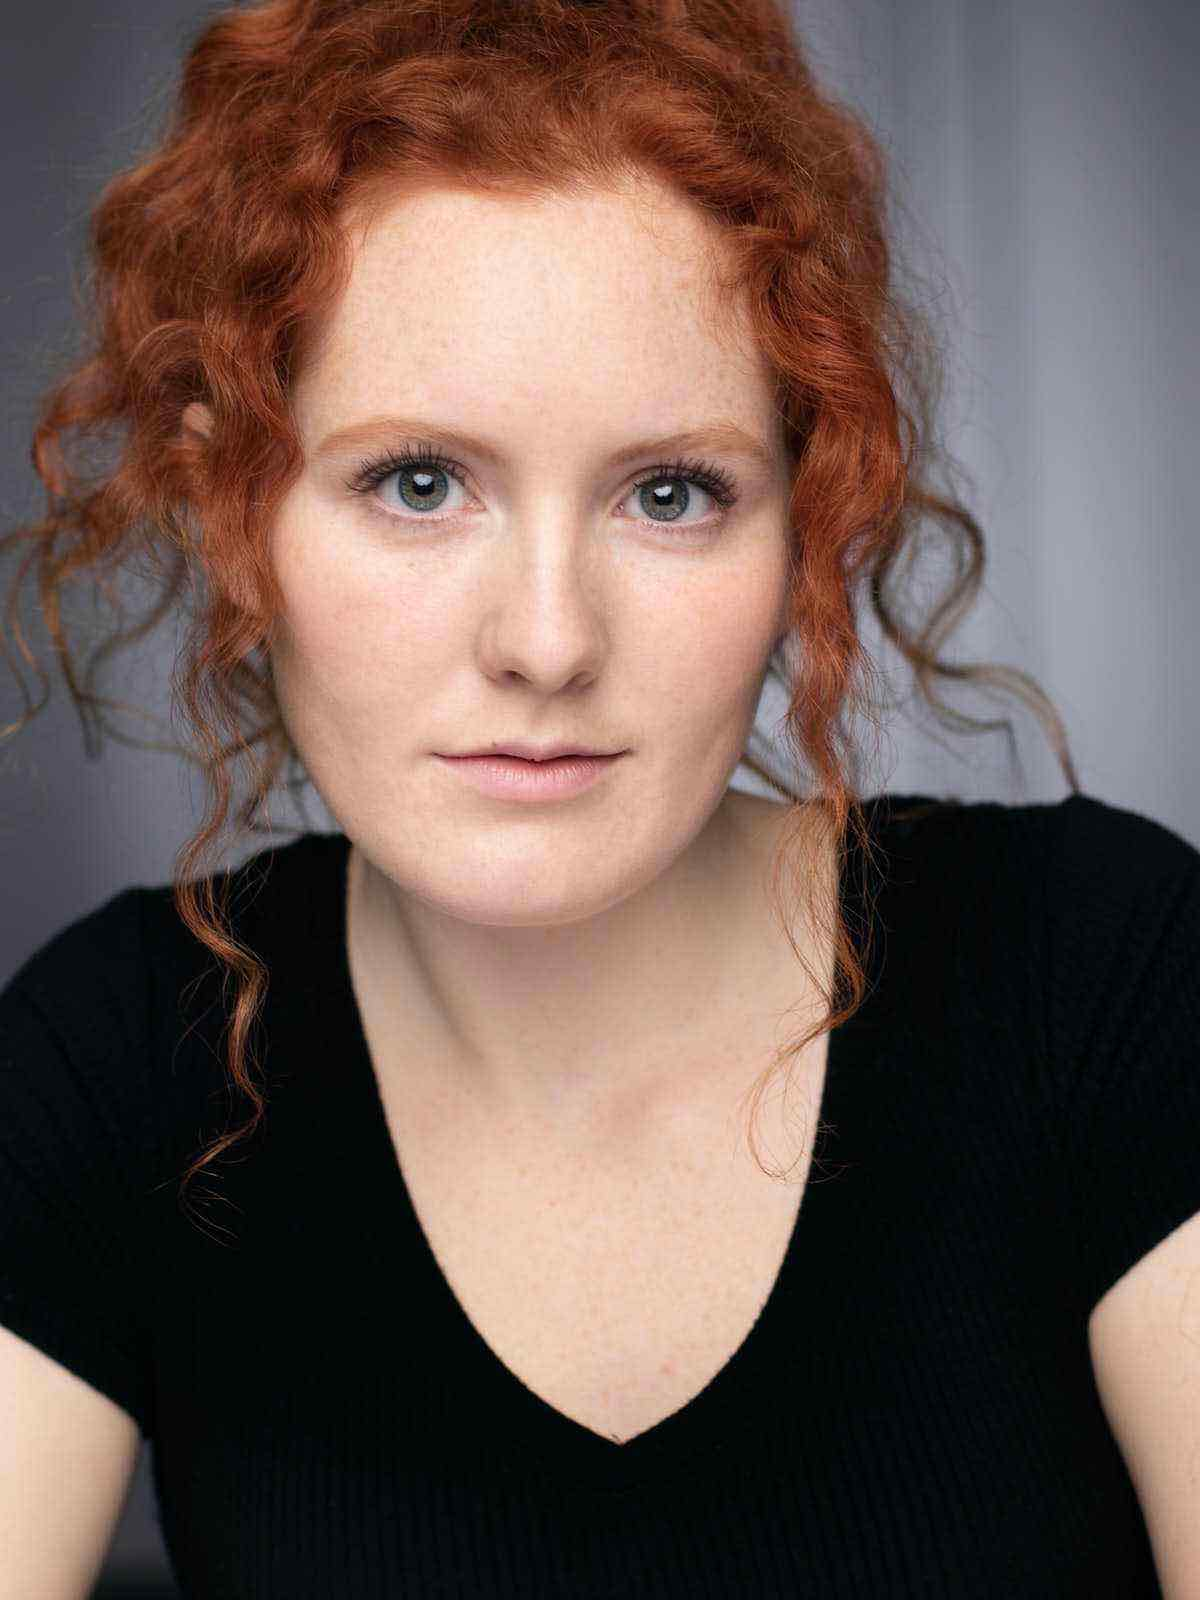 sce-agency-female-actor-josephine-o-1a